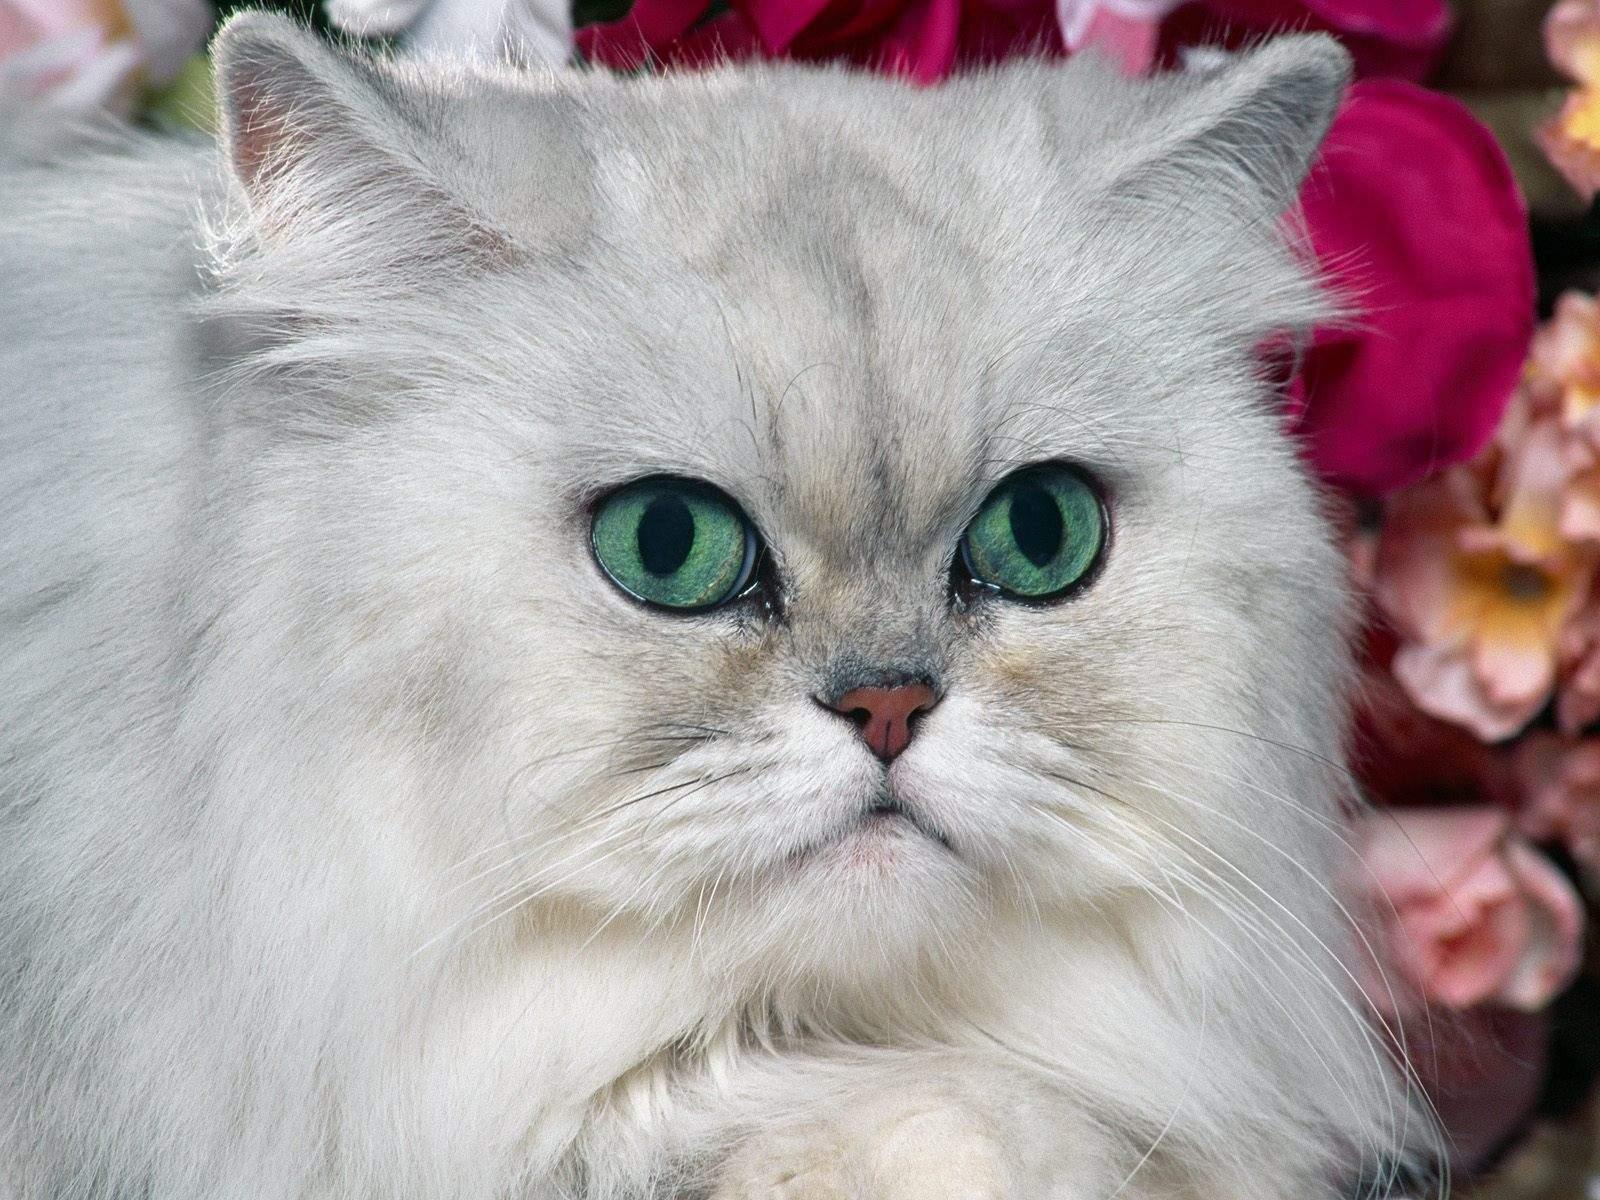 Cute Cat HQ Desktop Wallpaper HD Desktop Wallpaper Collections 1600x1200